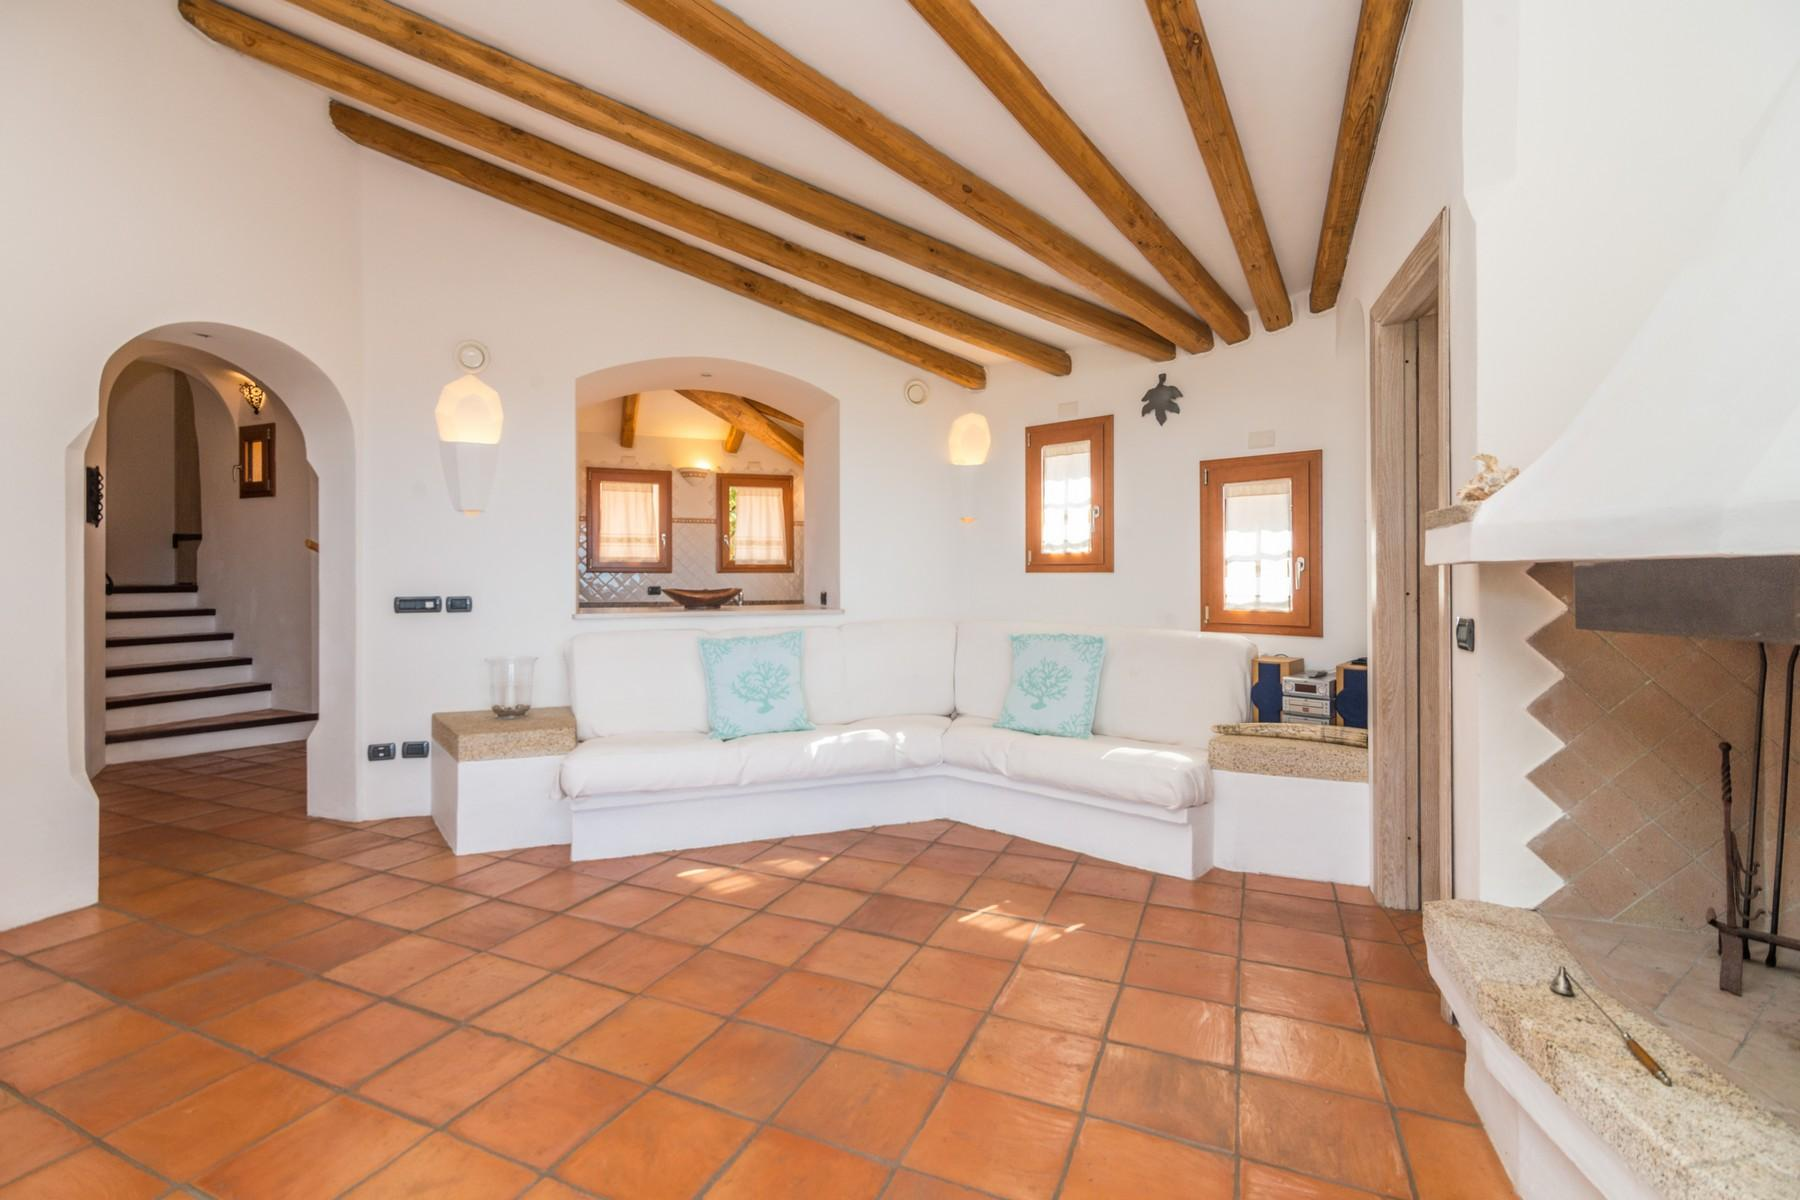 Porto Cervo Abbiadori Splendide villa jumelée avec vue sur le golfe de Pevero - 12